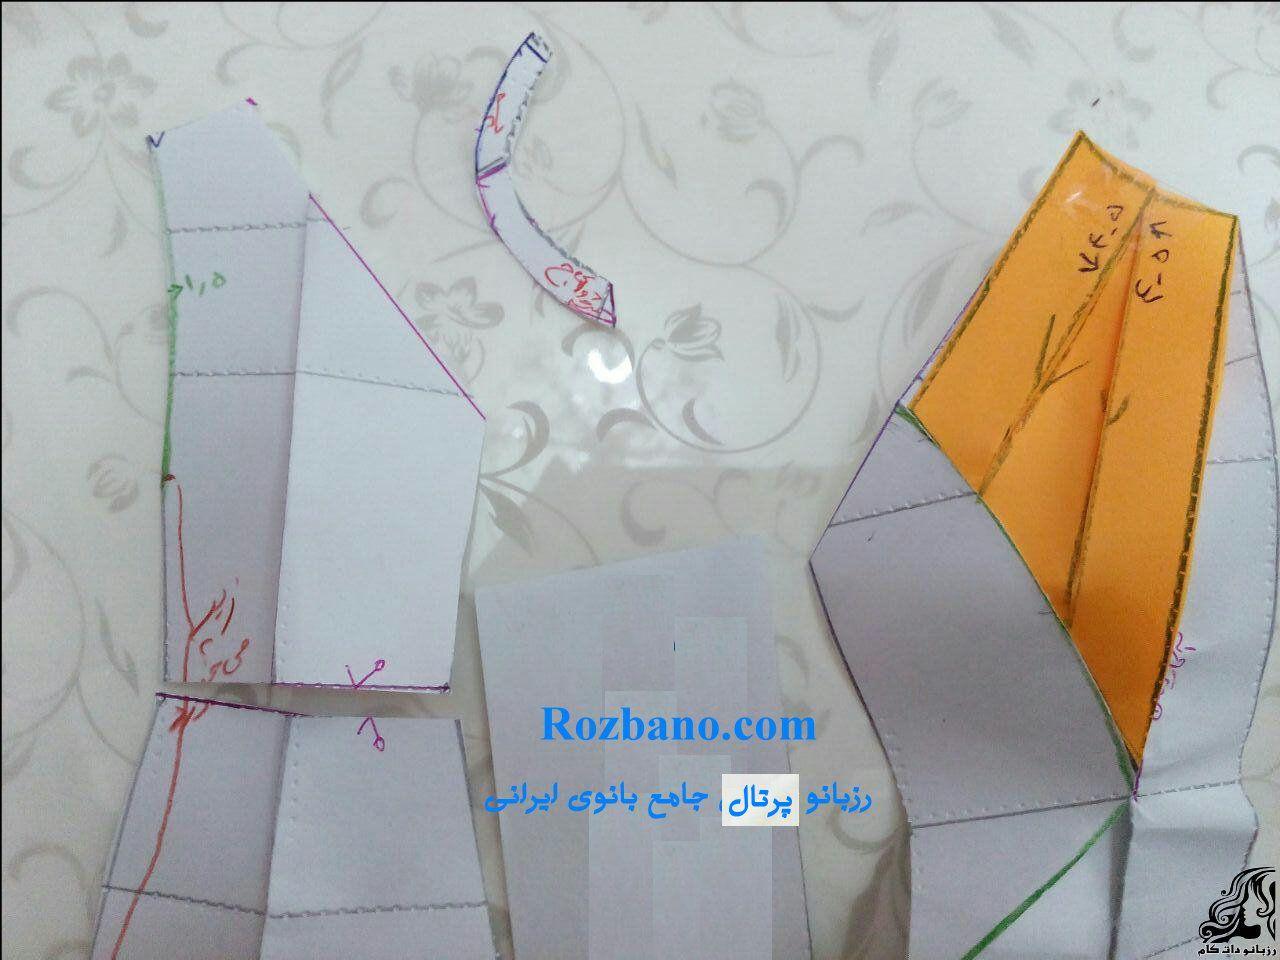 https://up.rozbano.com/view/2205357/rozbano-437-11.jpg